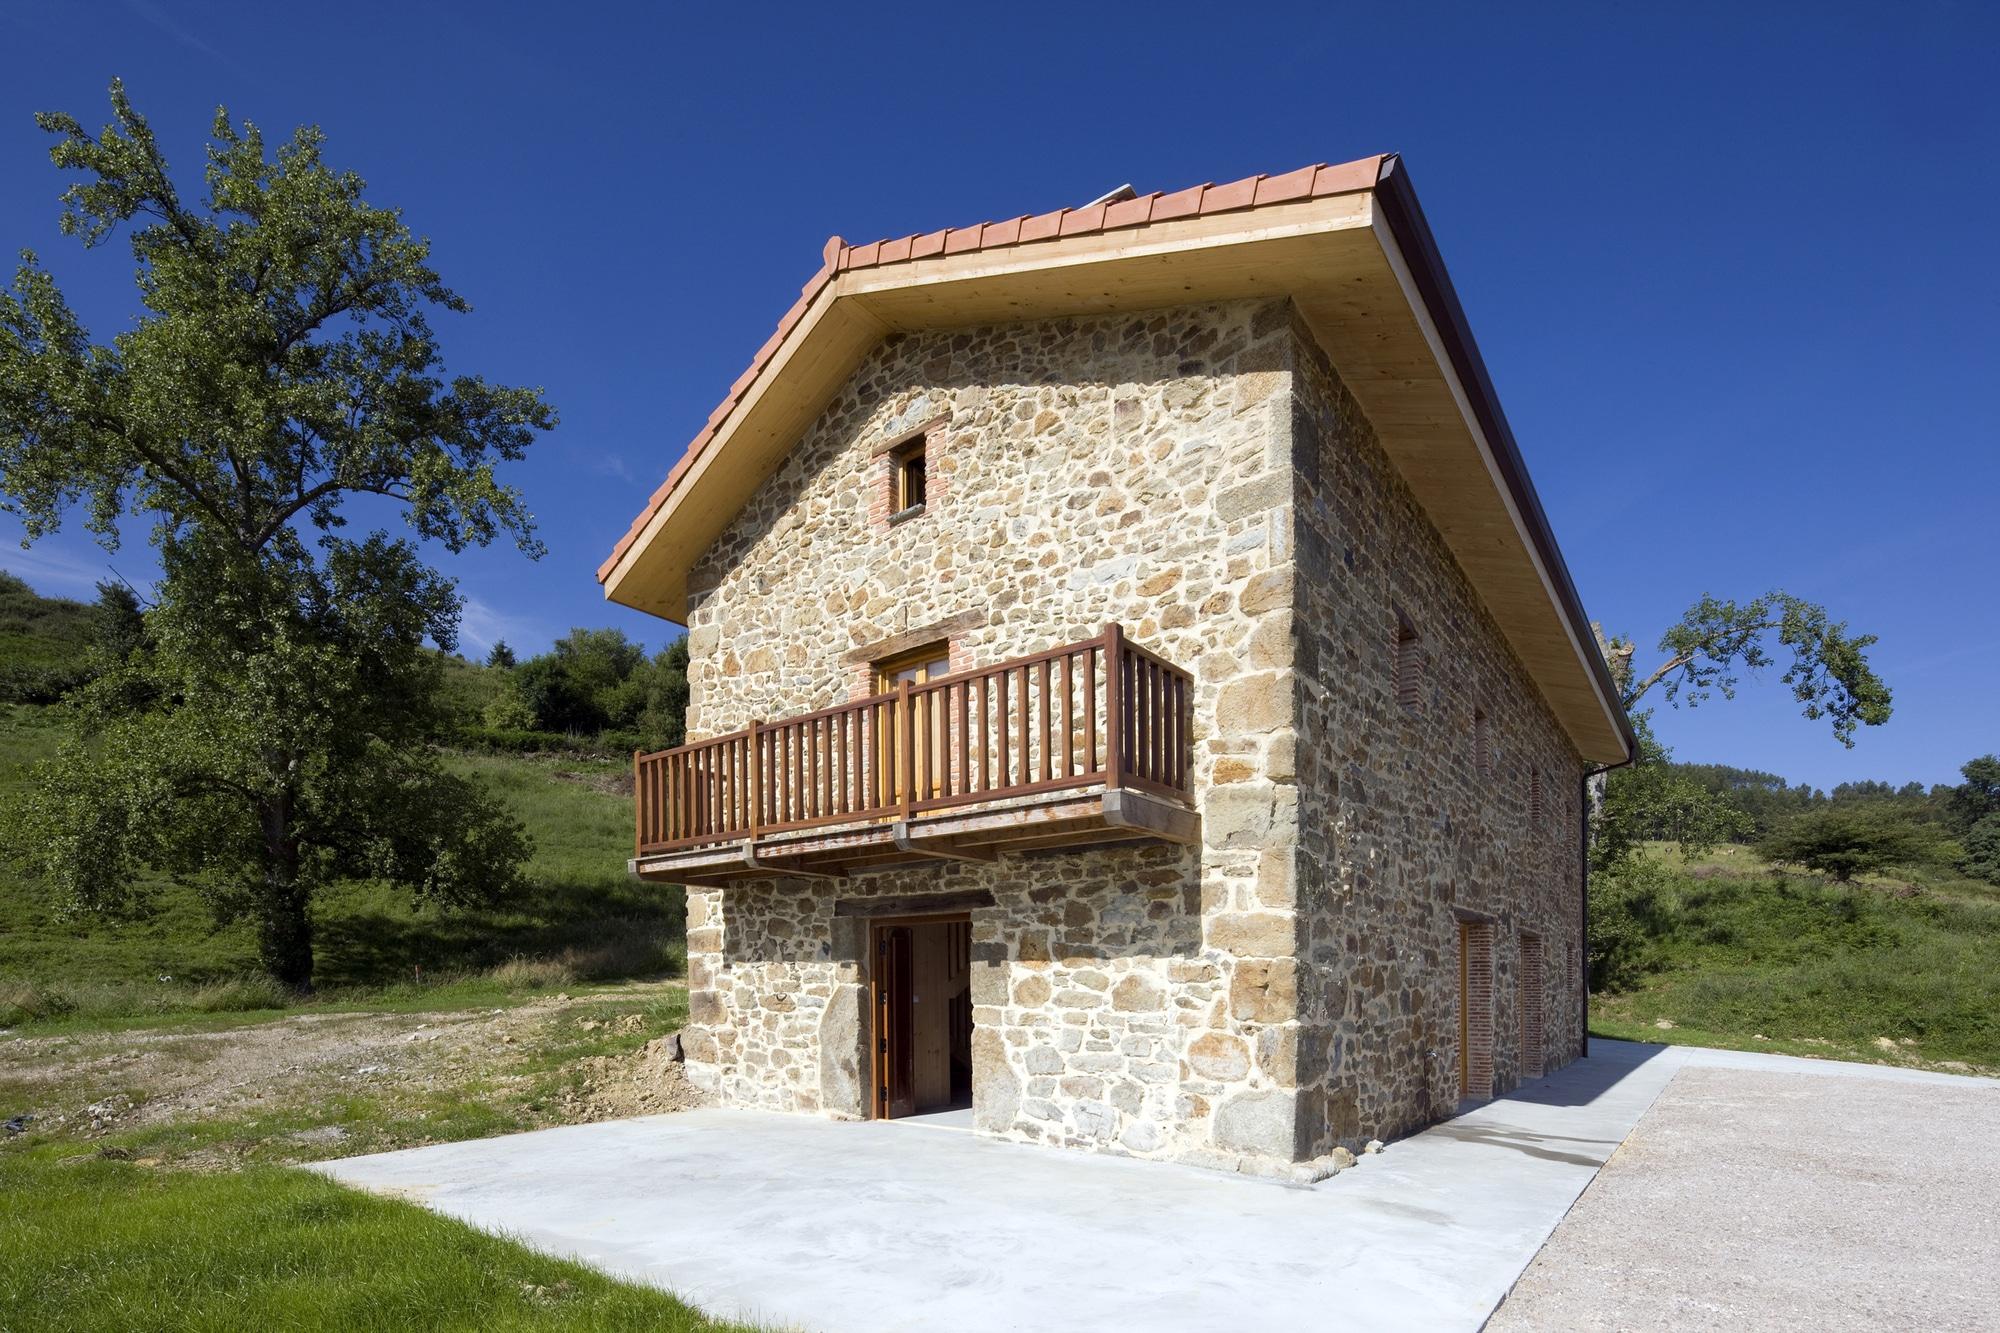 Dise o de casa r stica de piedra planos construye hogar - Casas de piedra gallegas ...